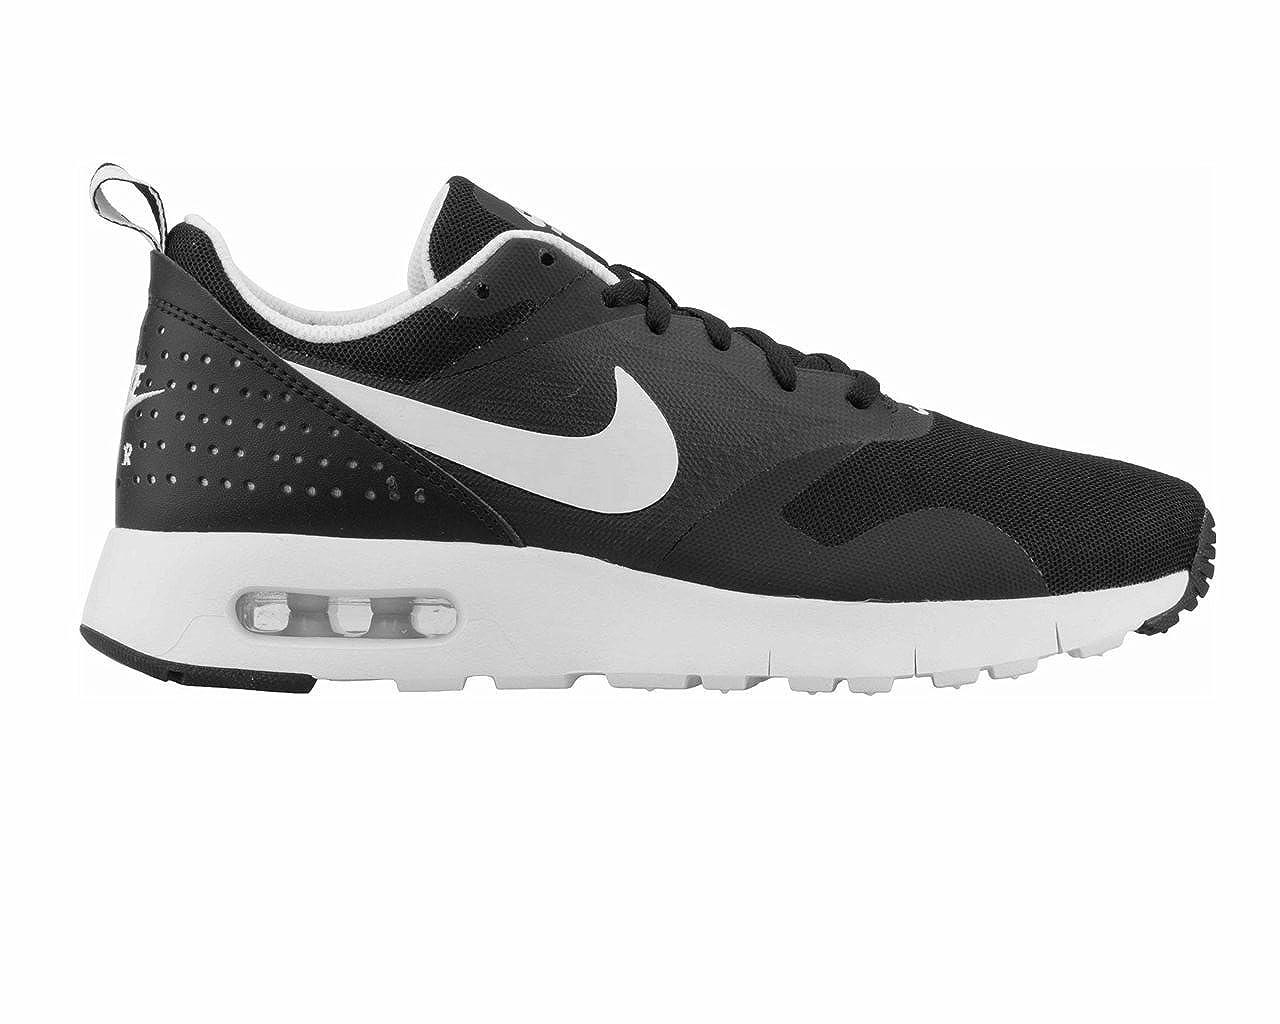 Nike AIR MAX Tavas GS 814443 001 Black White Trainers